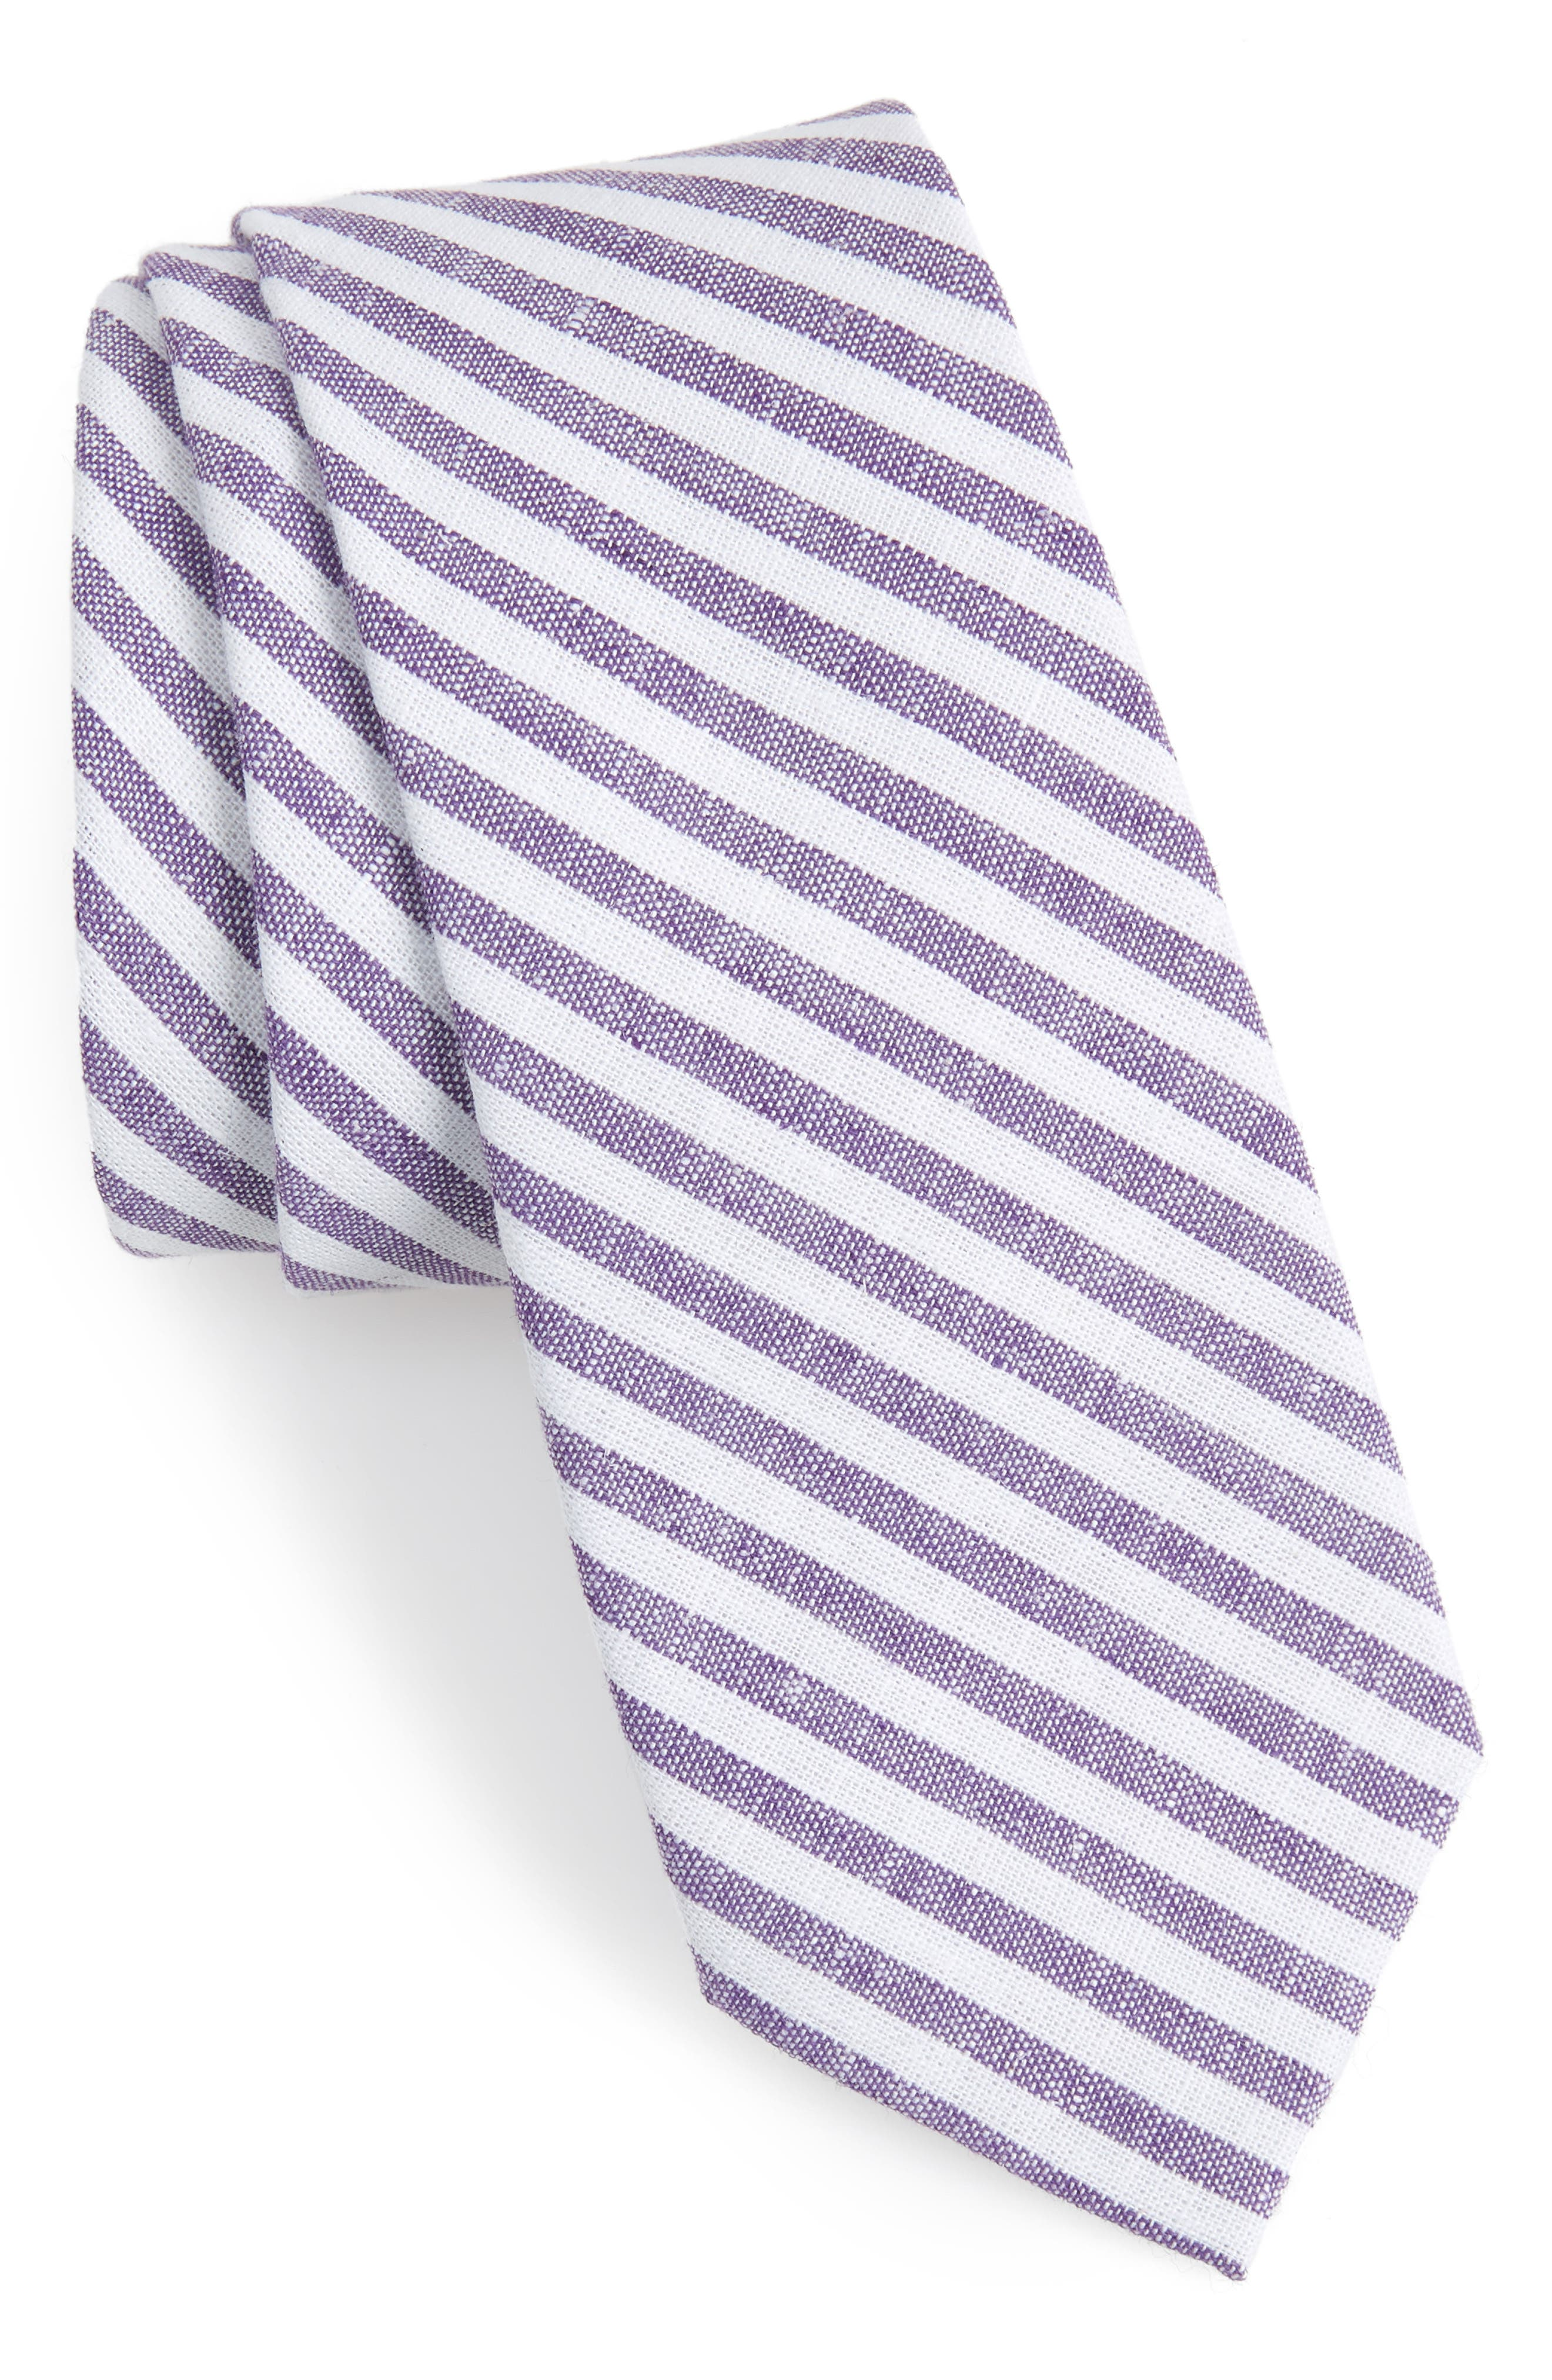 Nordstrom Men's Shop Telary Stripe Cotton Skinny Tie